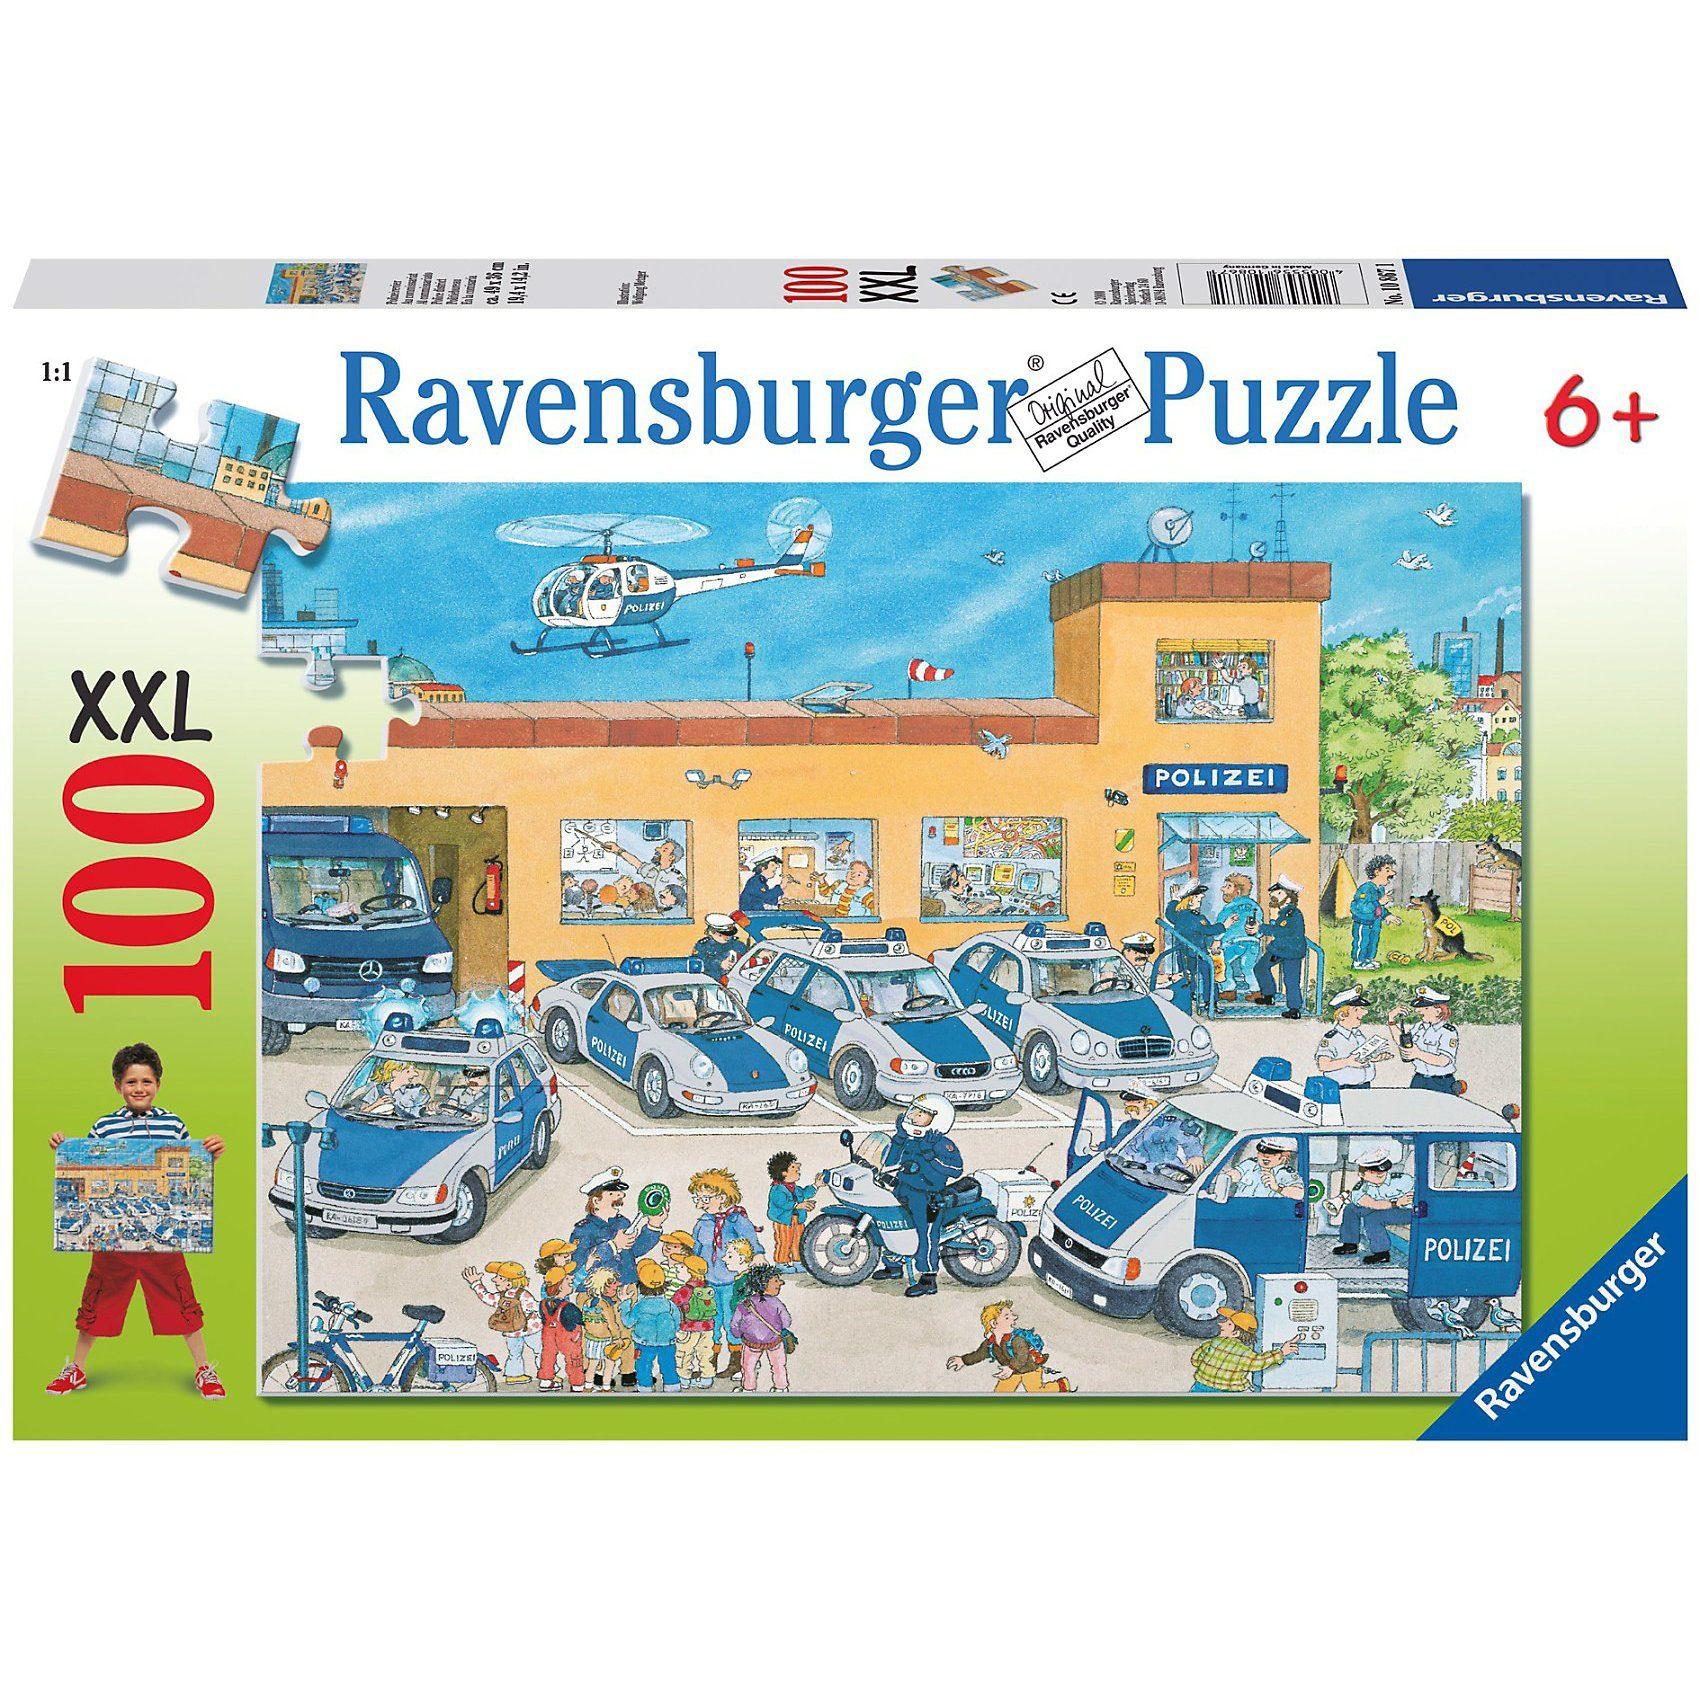 Ravensburger Puzzle XXL-100 Teile- Polizeirevier